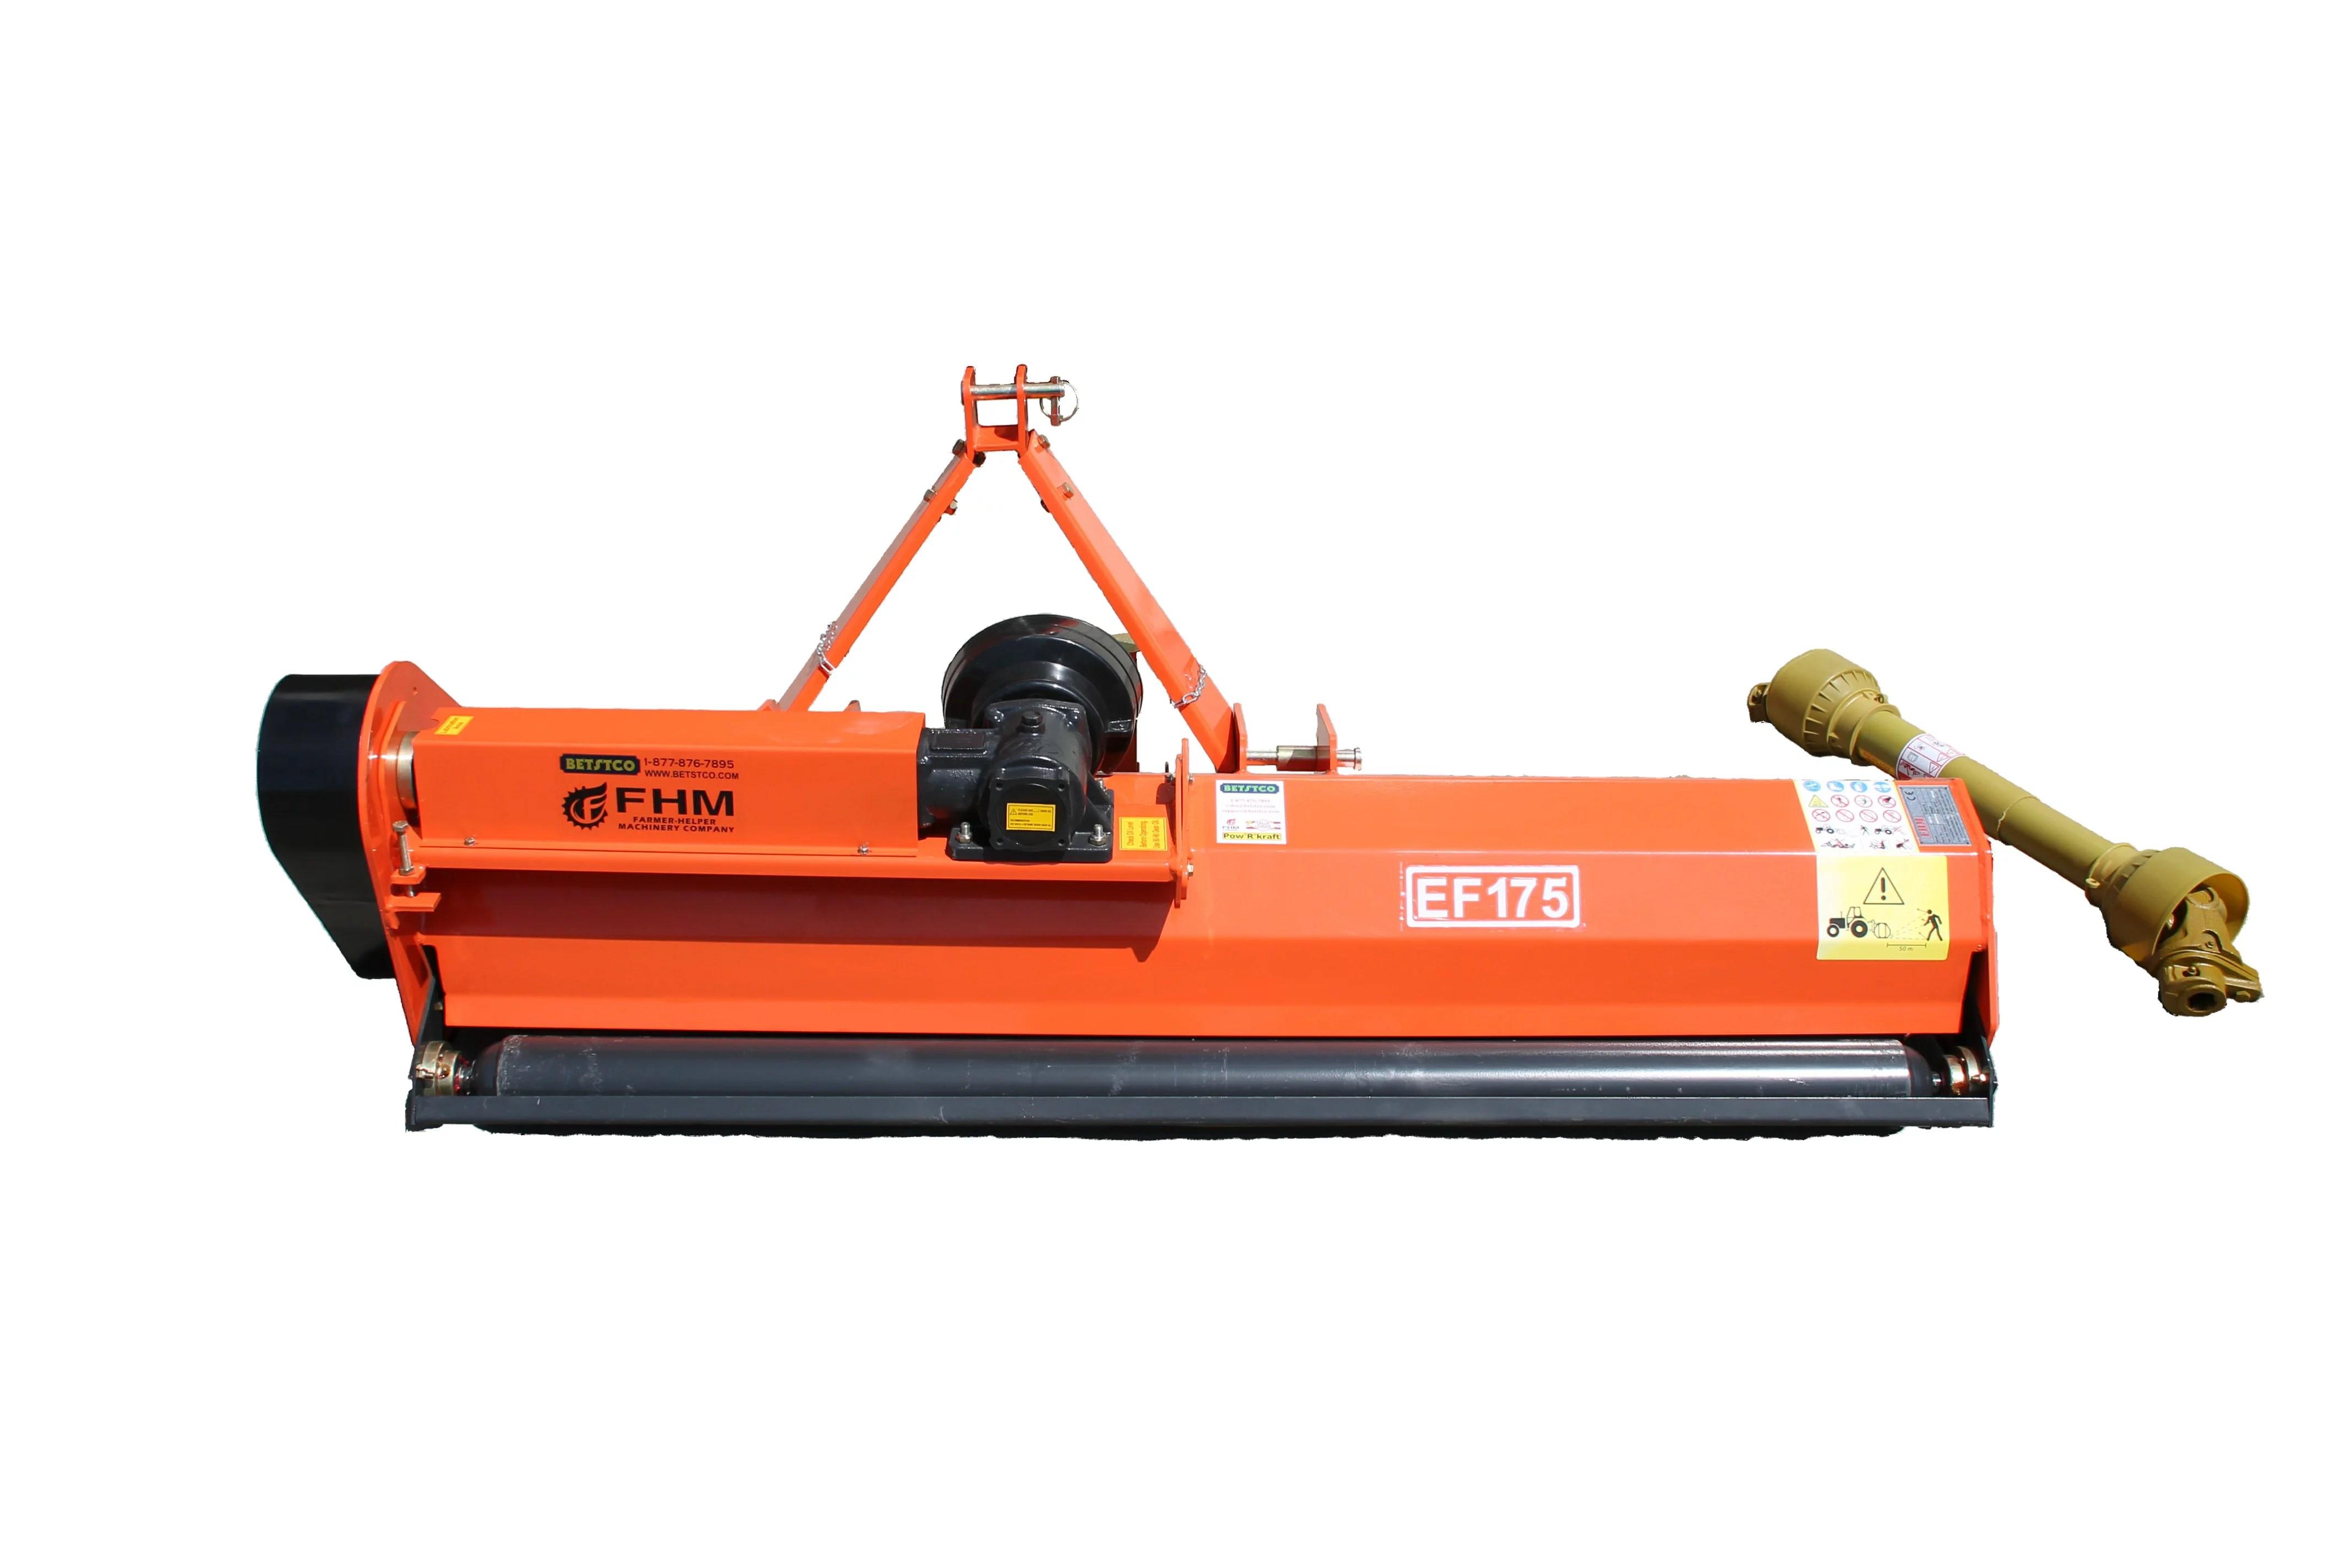 Farmer Helper 68″ Field Flail Mower Cat.I 3pt 28HP+ Rating (FH-EF175)